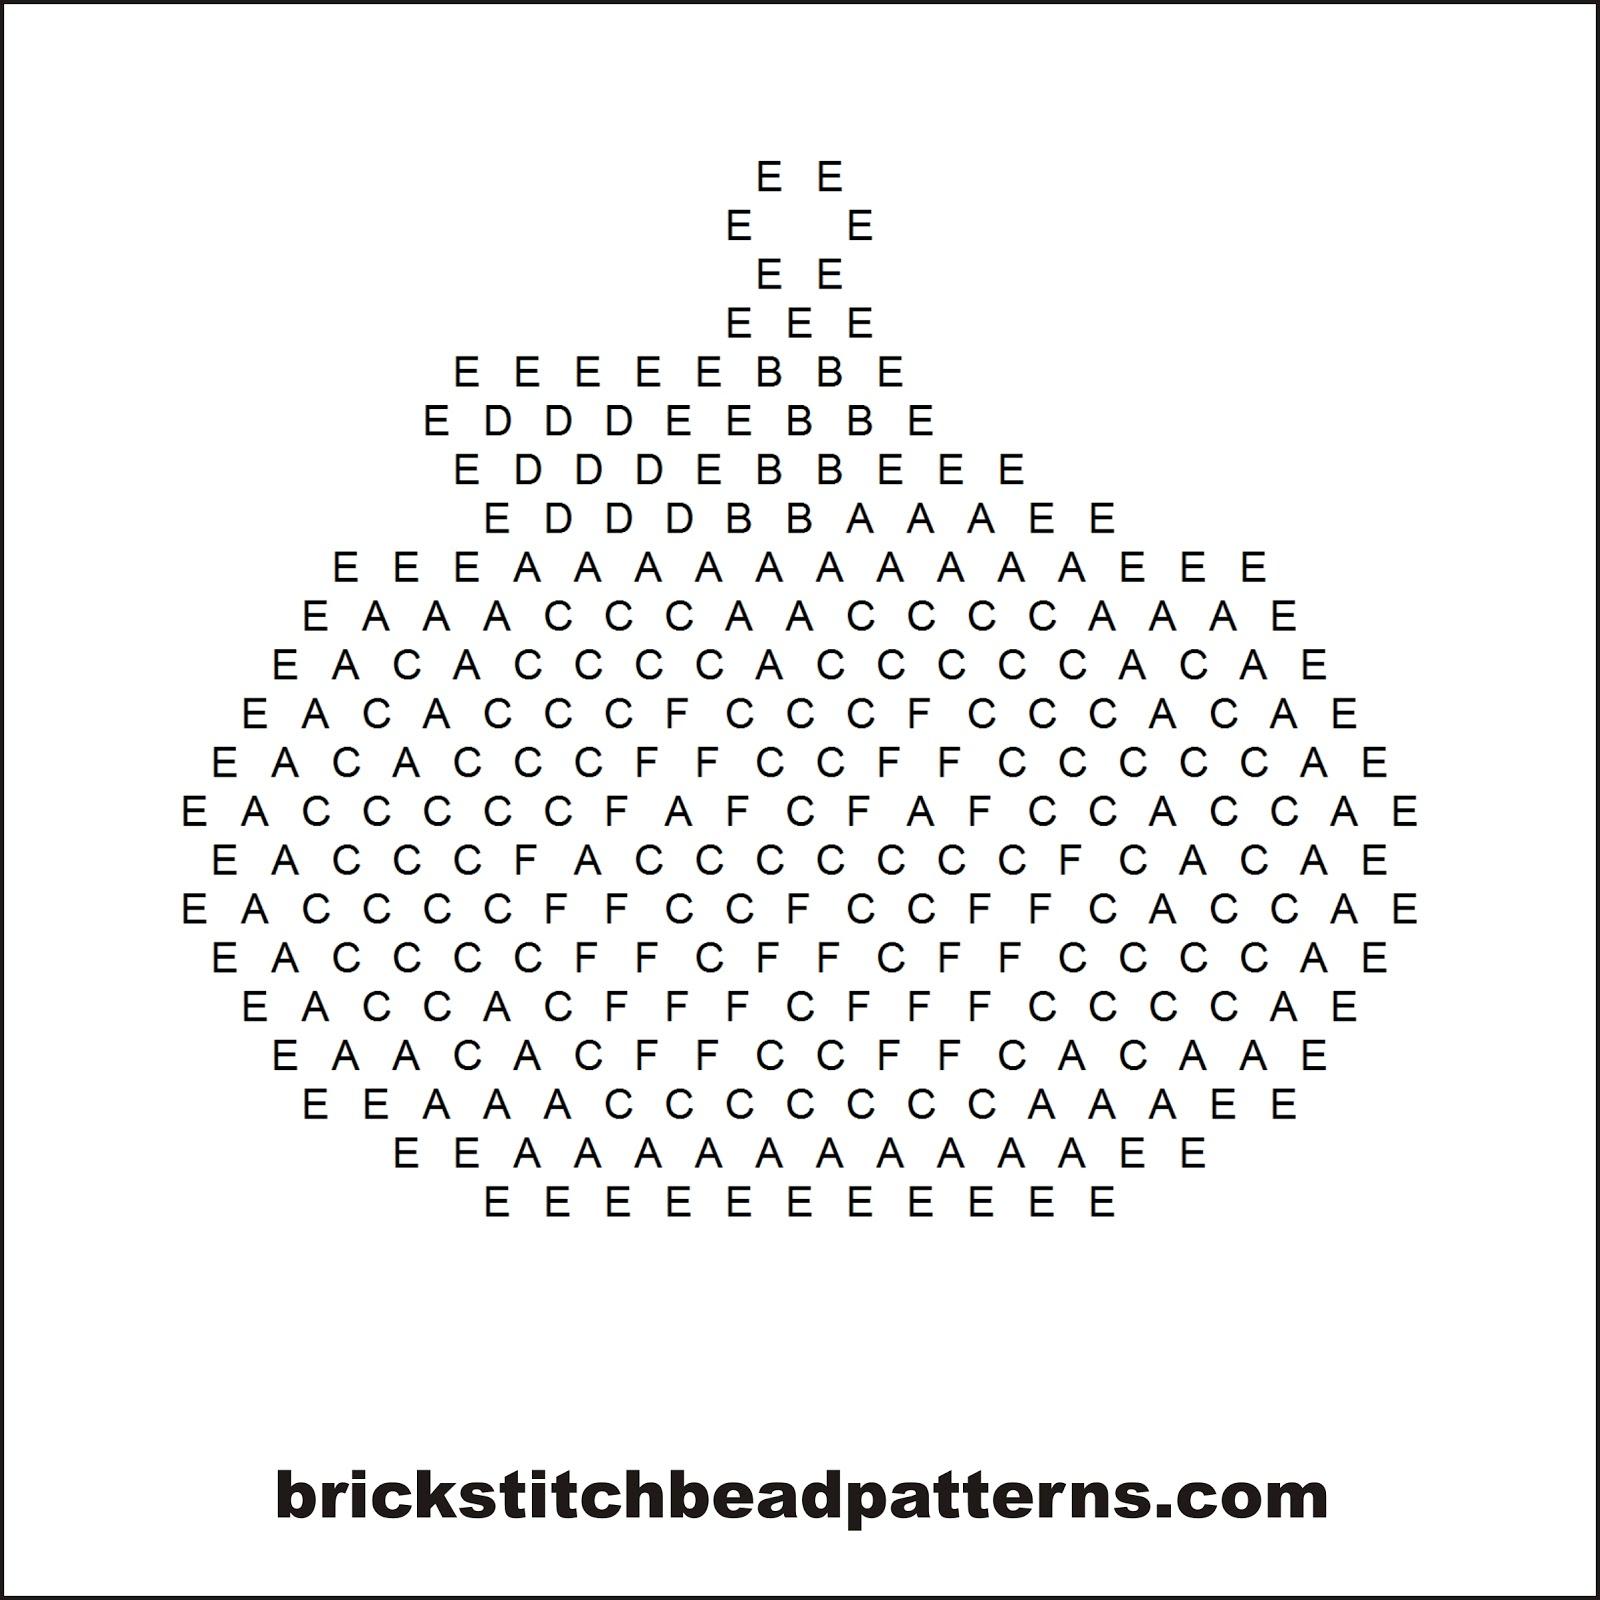 Free Halloween Jack O Lantern Pumpkin Brick Stitch Seed Bead Earring Pattern Letter Chart